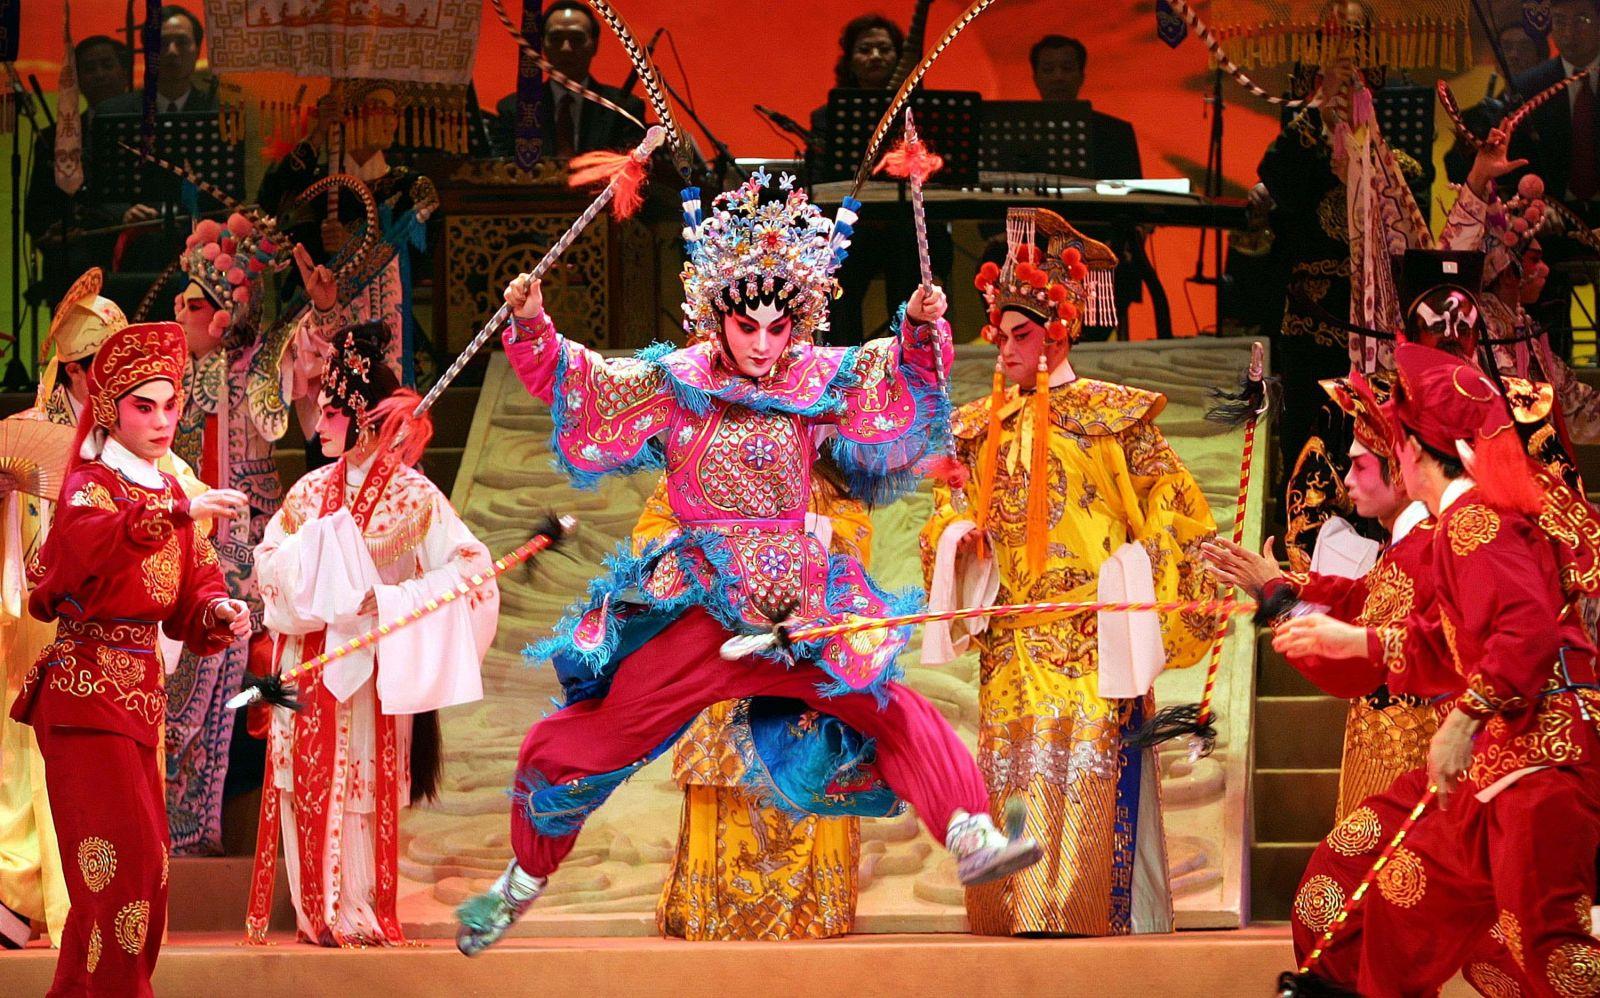 Театр в Шанхае